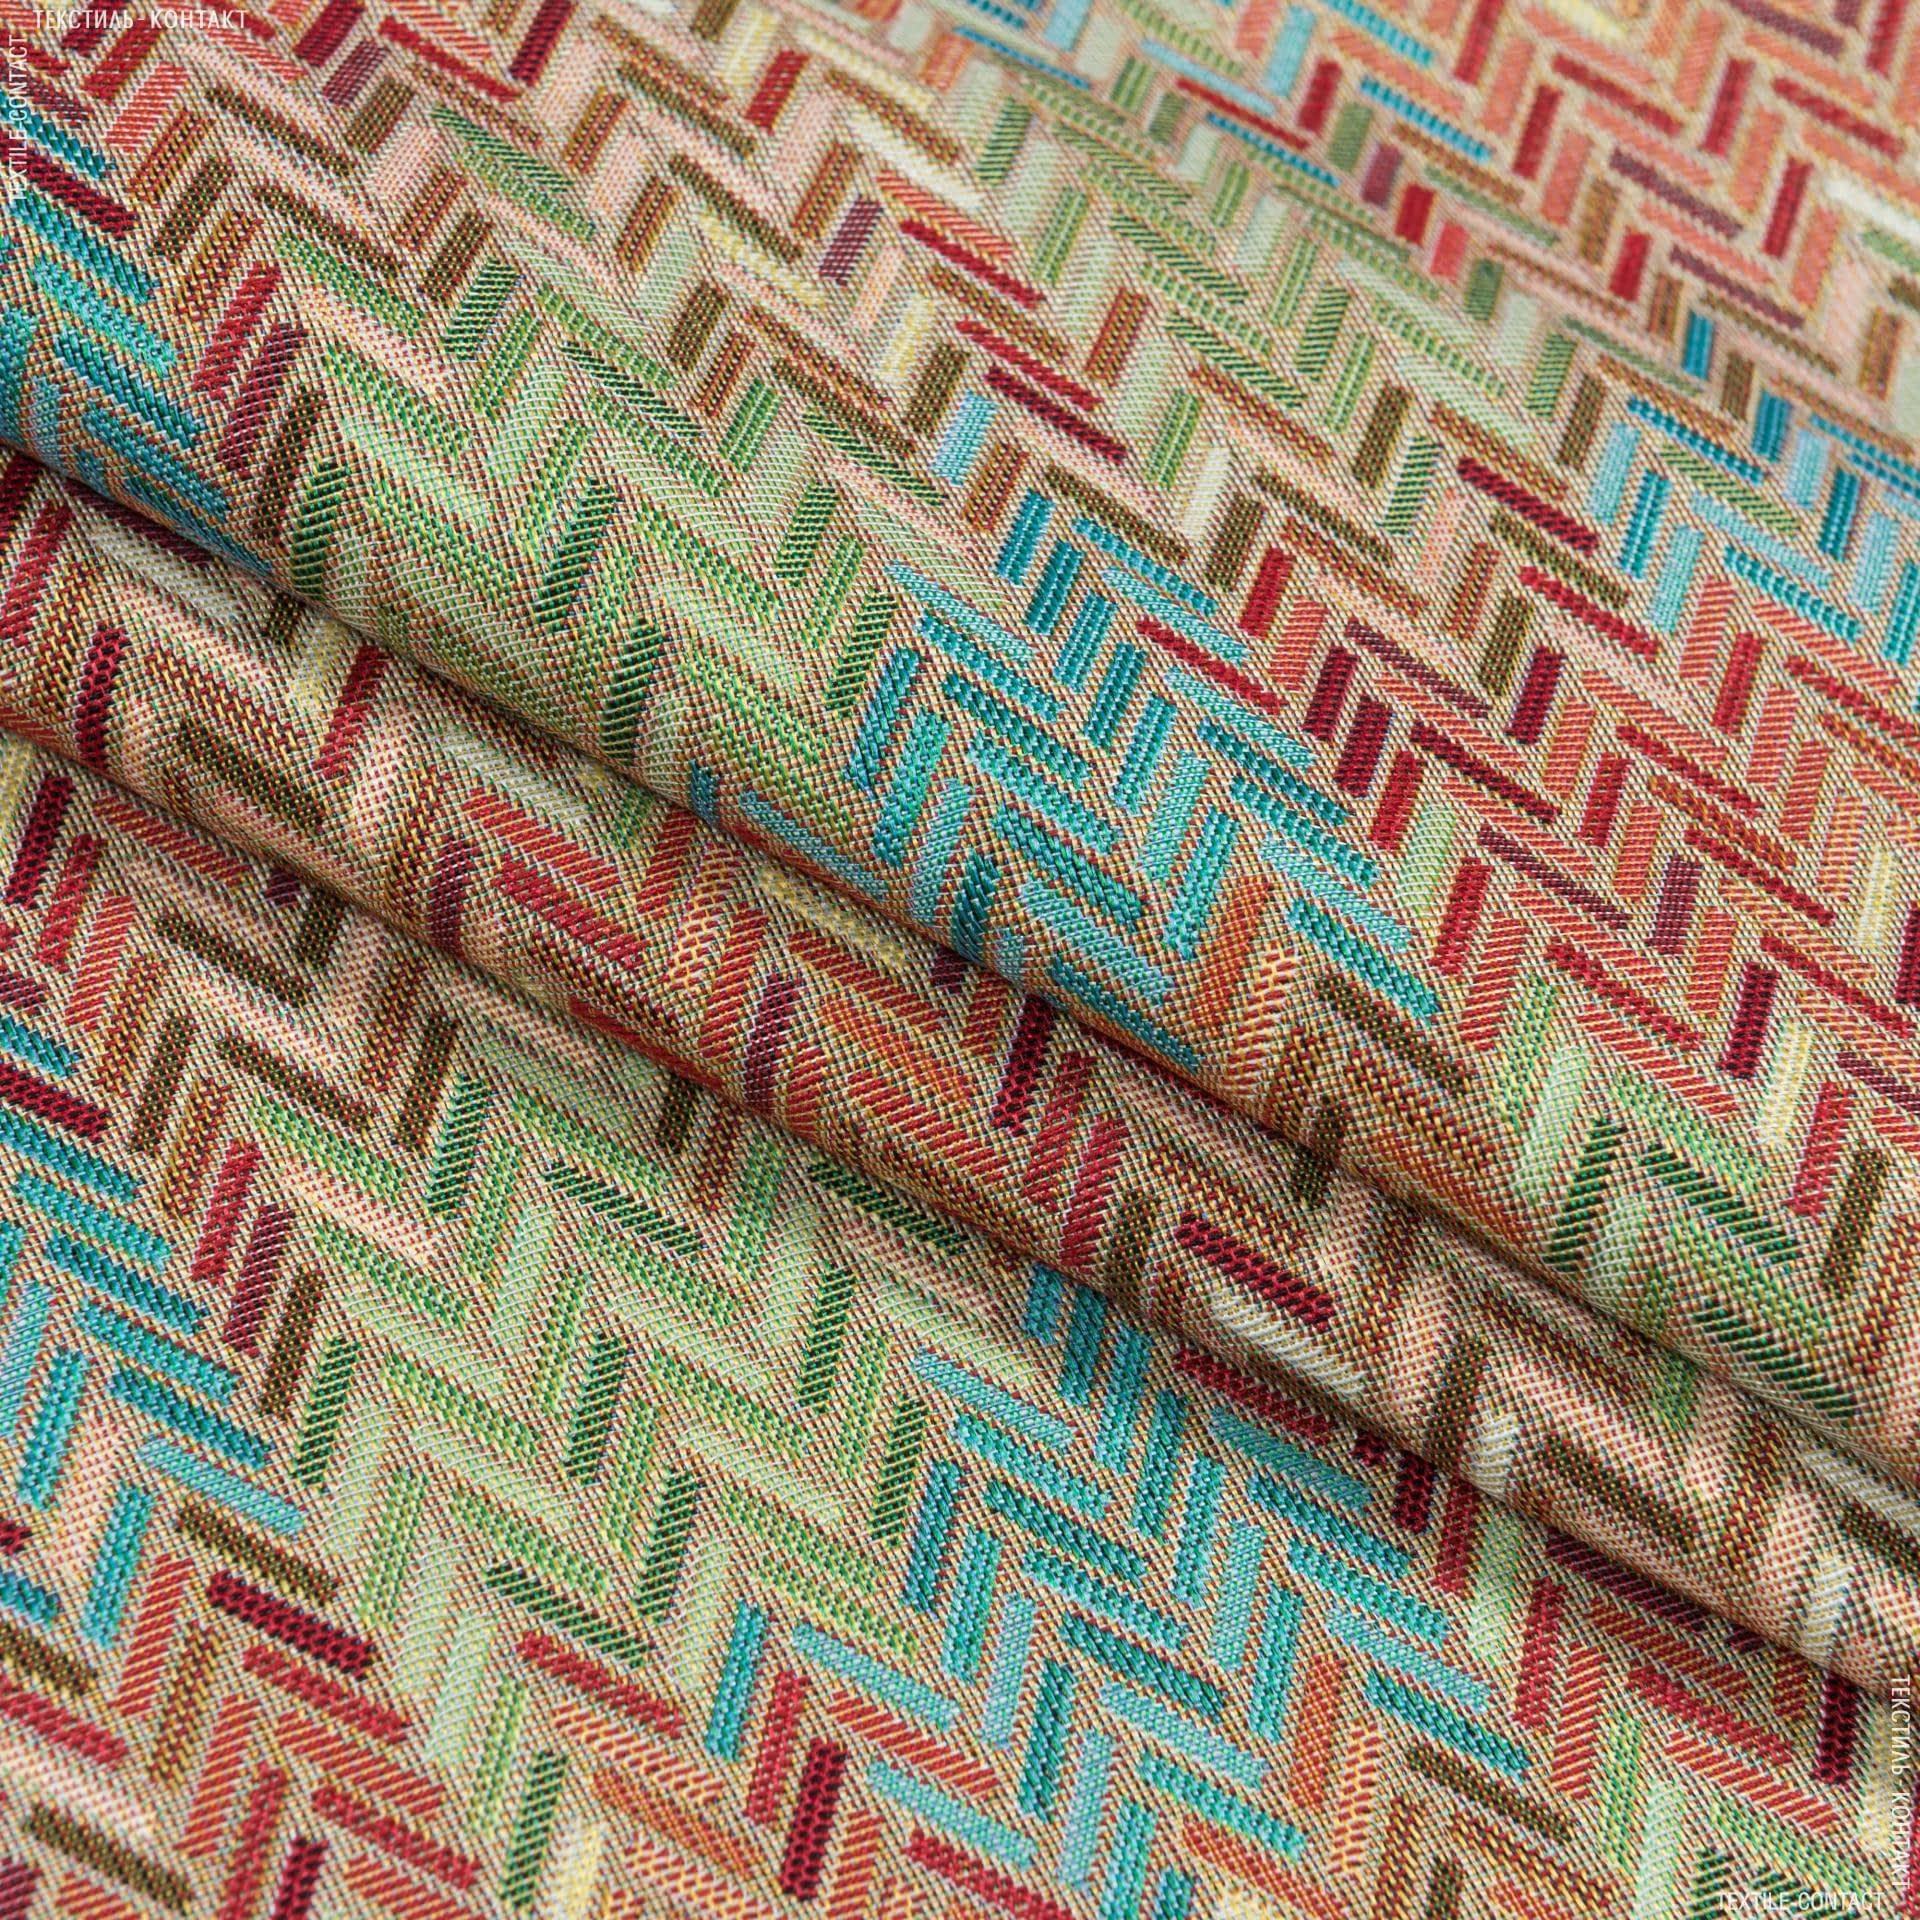 Тканини для декоративних подушок - Декор-гобелен орнамент толосол/tollosol мультиколор